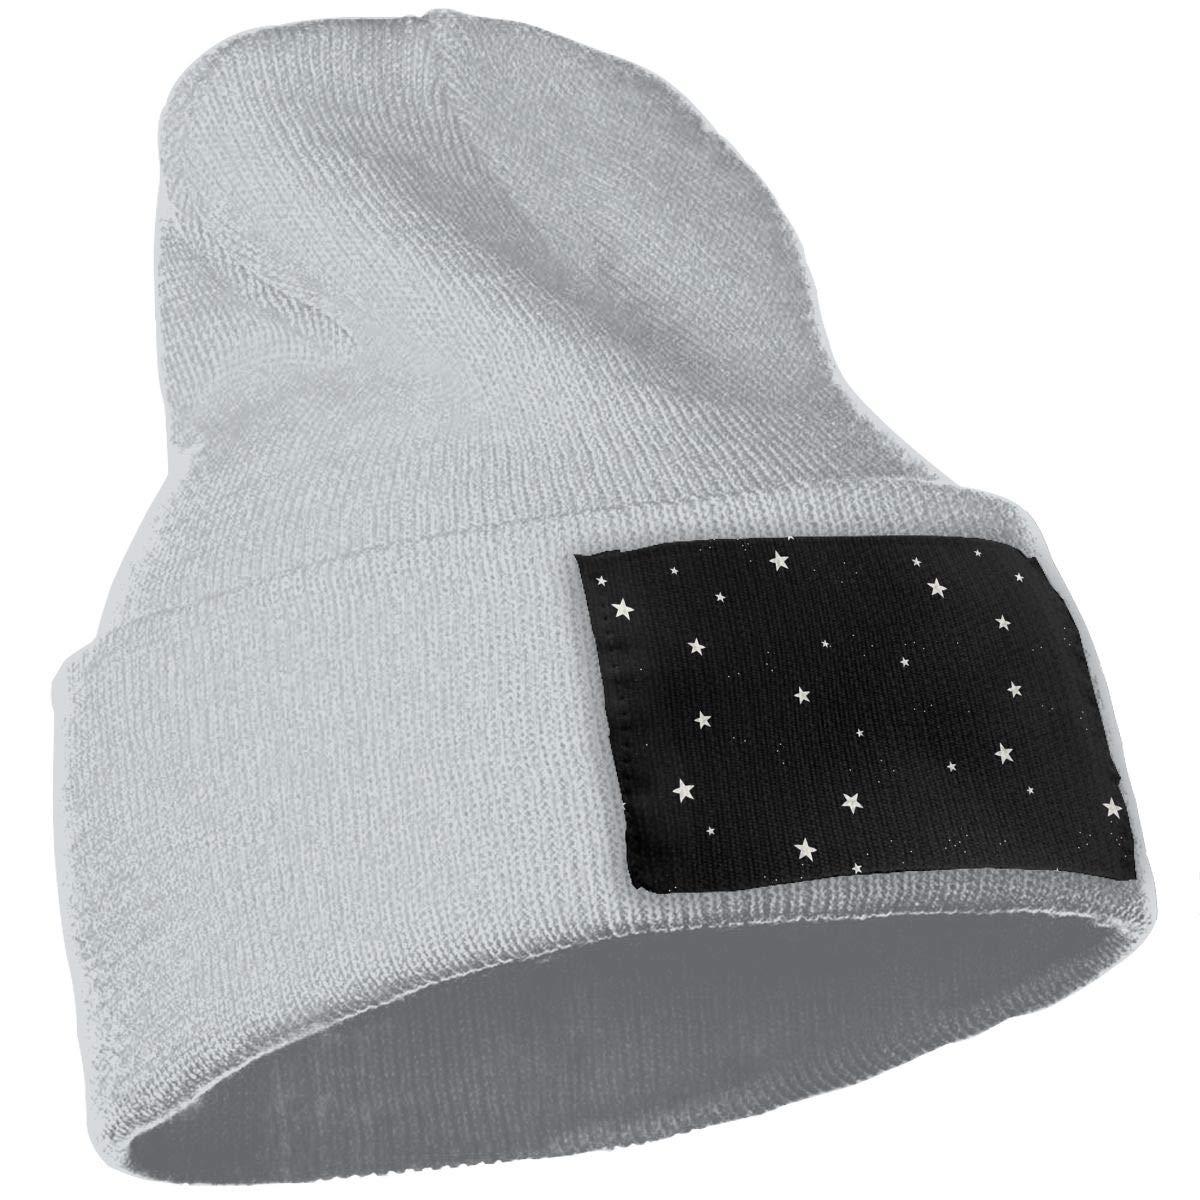 Yubb7E Stars Warm Knit Winter Solid Beanie Hat Unisex Skull Cap